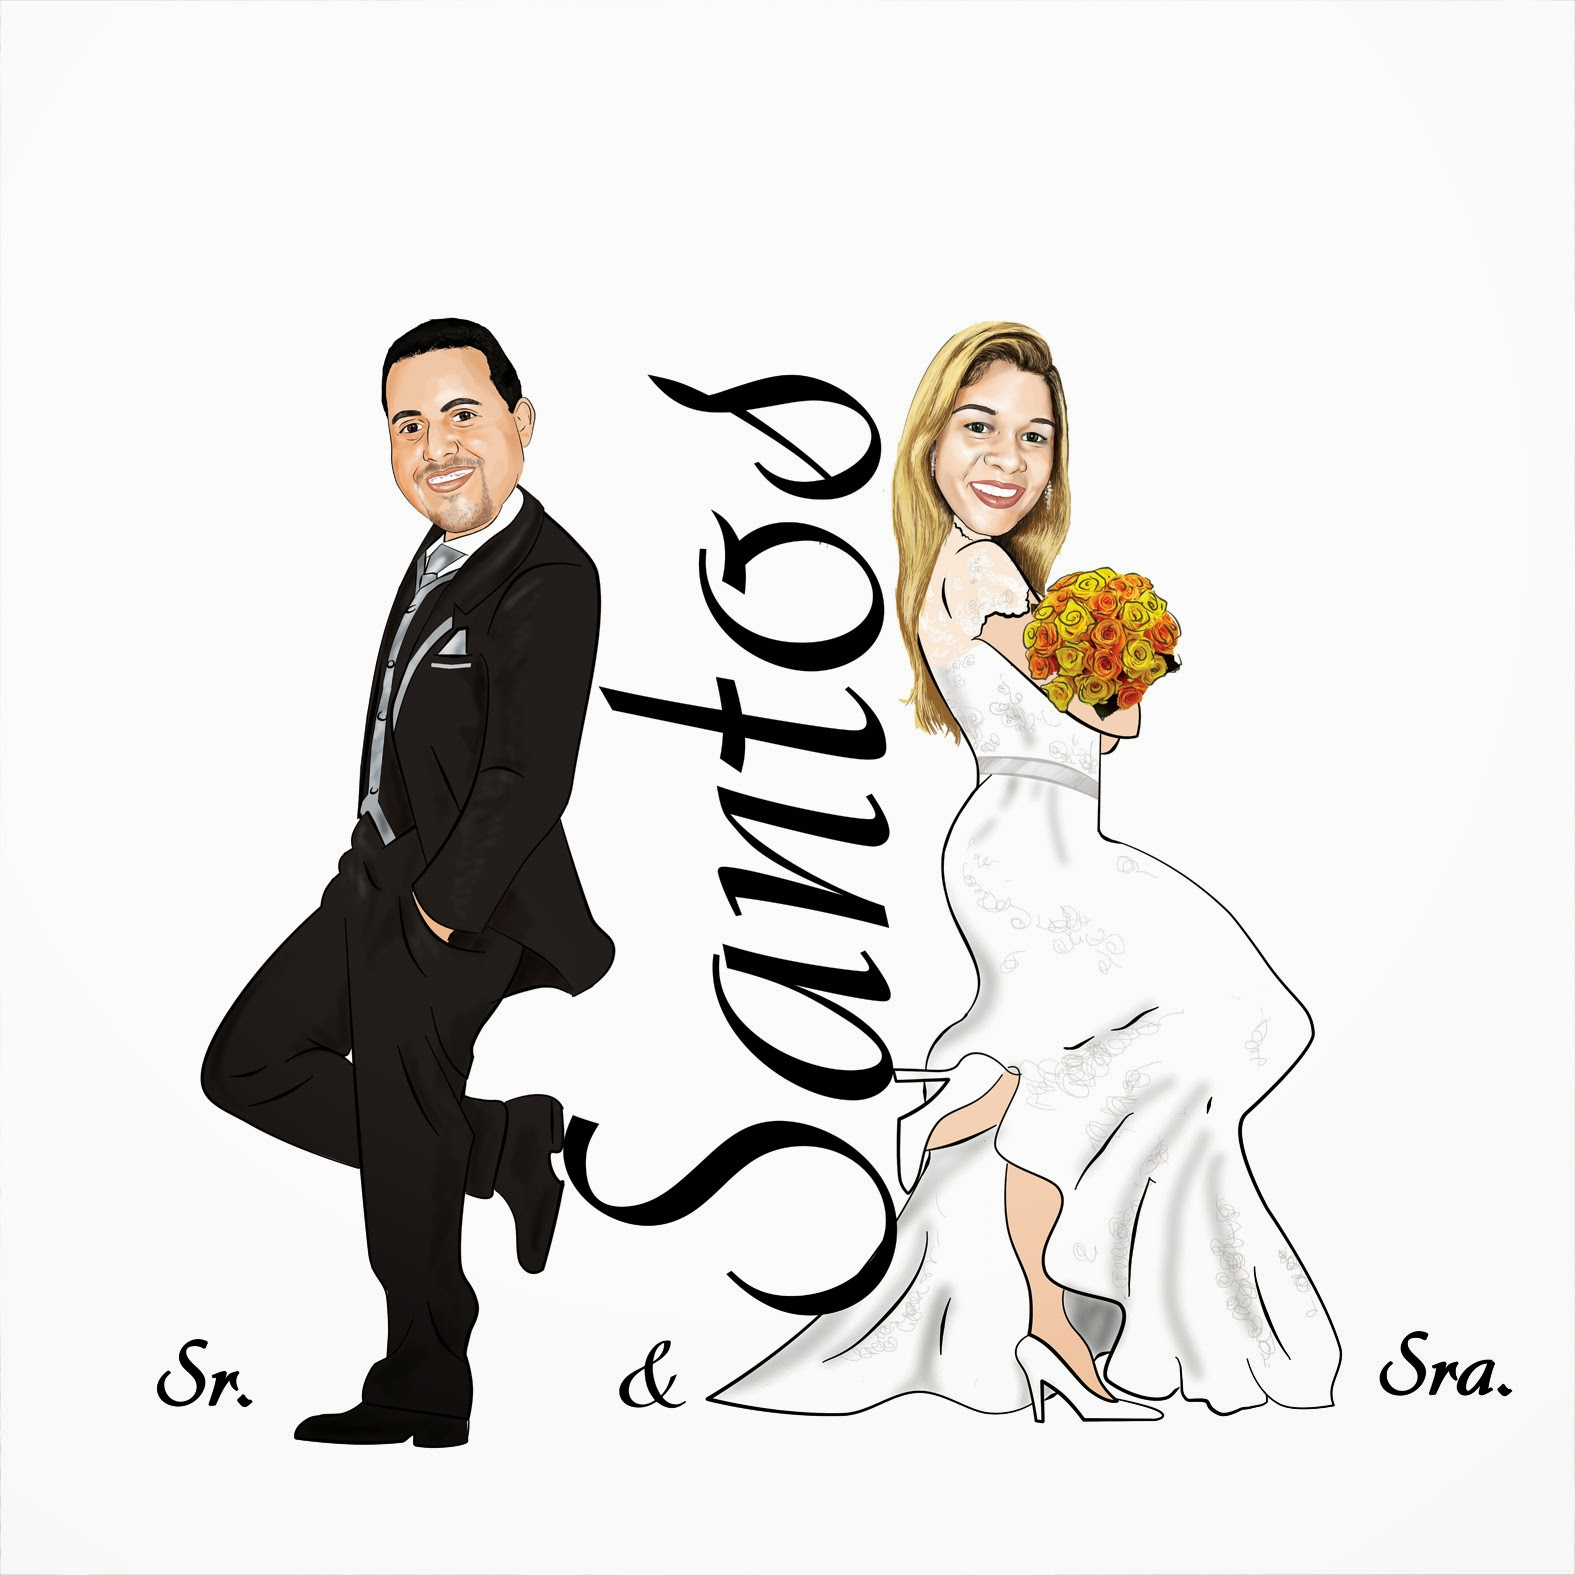 caricatura-noivos-casamento-caricatura-n